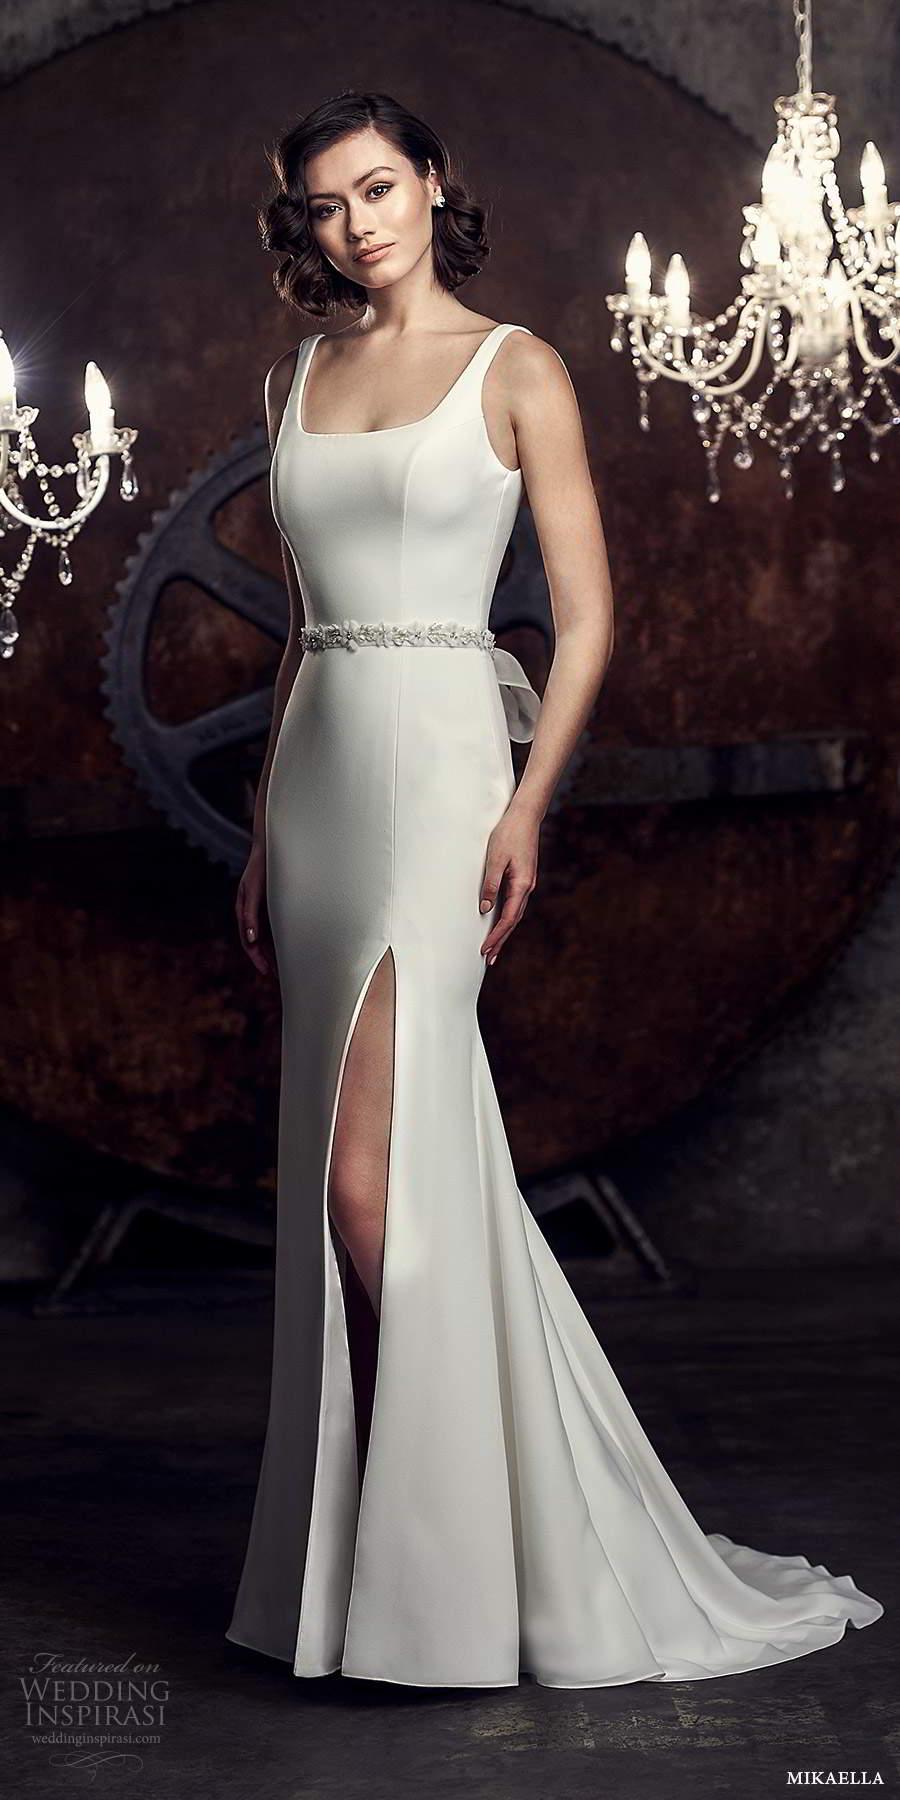 mikaella fall 2020 bridal sleeveless thick straps square neckline clean minimalist modern sheath fit flare wedding dress slit skirt chapel train (9) mv